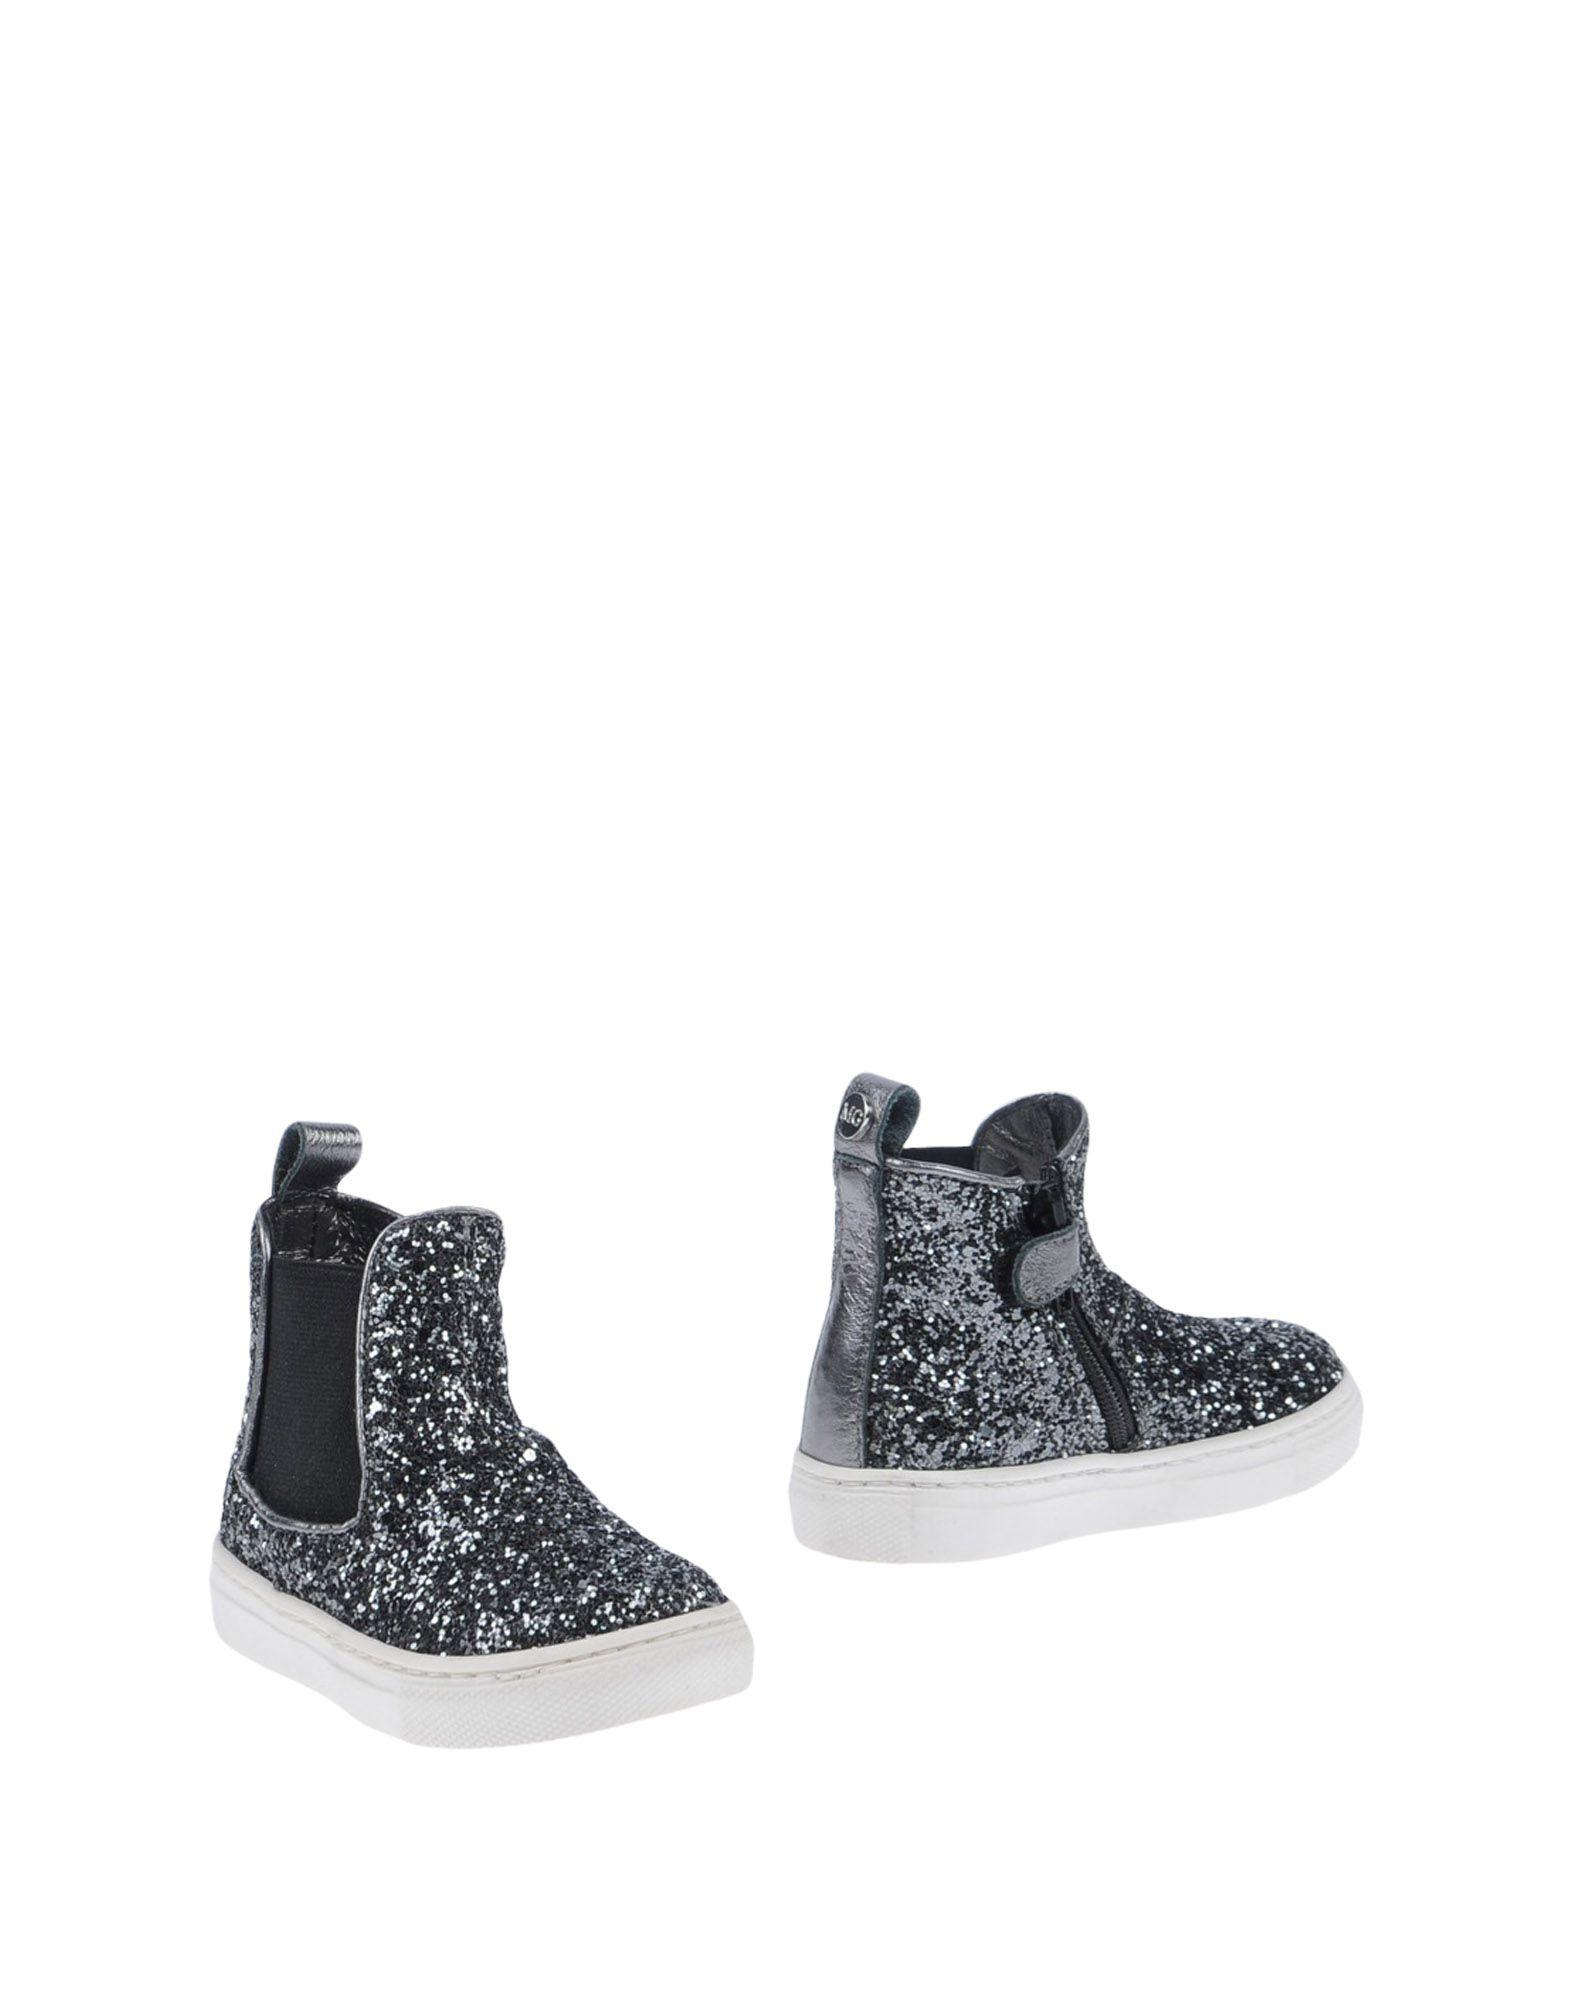 MISS GRANT Полусапоги и высокие ботинки miss unique полусапоги и высокие ботинки